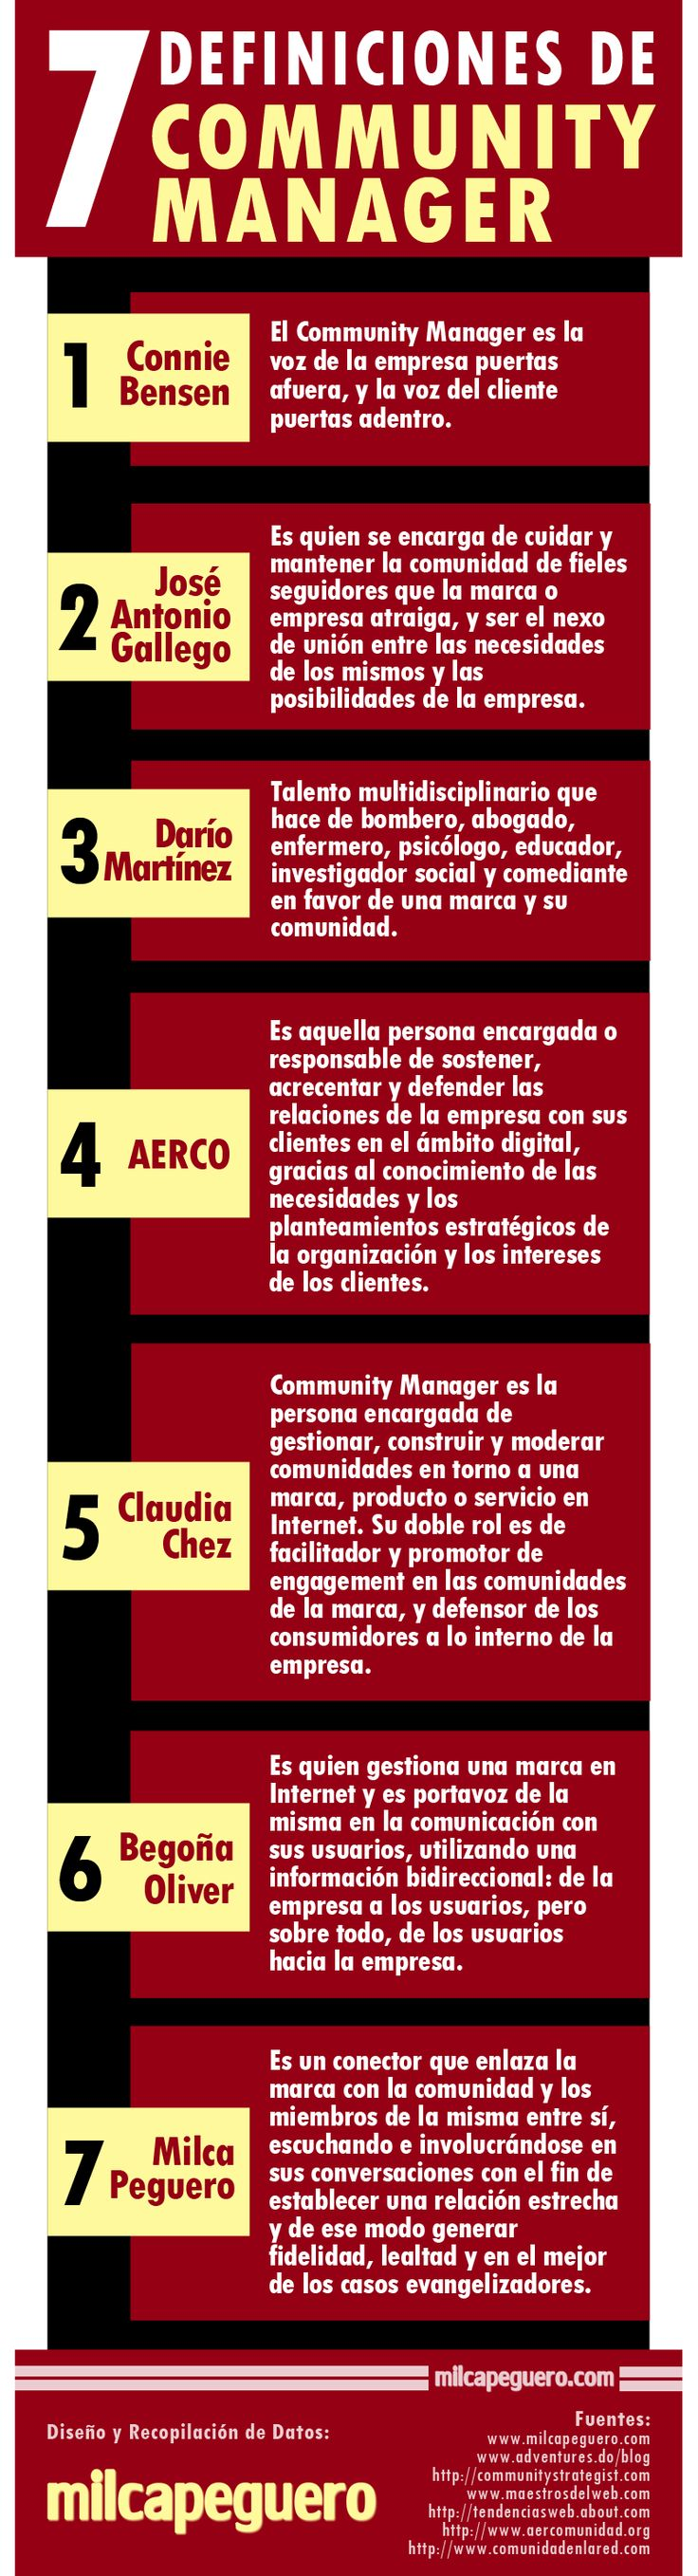 7 definiciones del #Community Manager #infografia